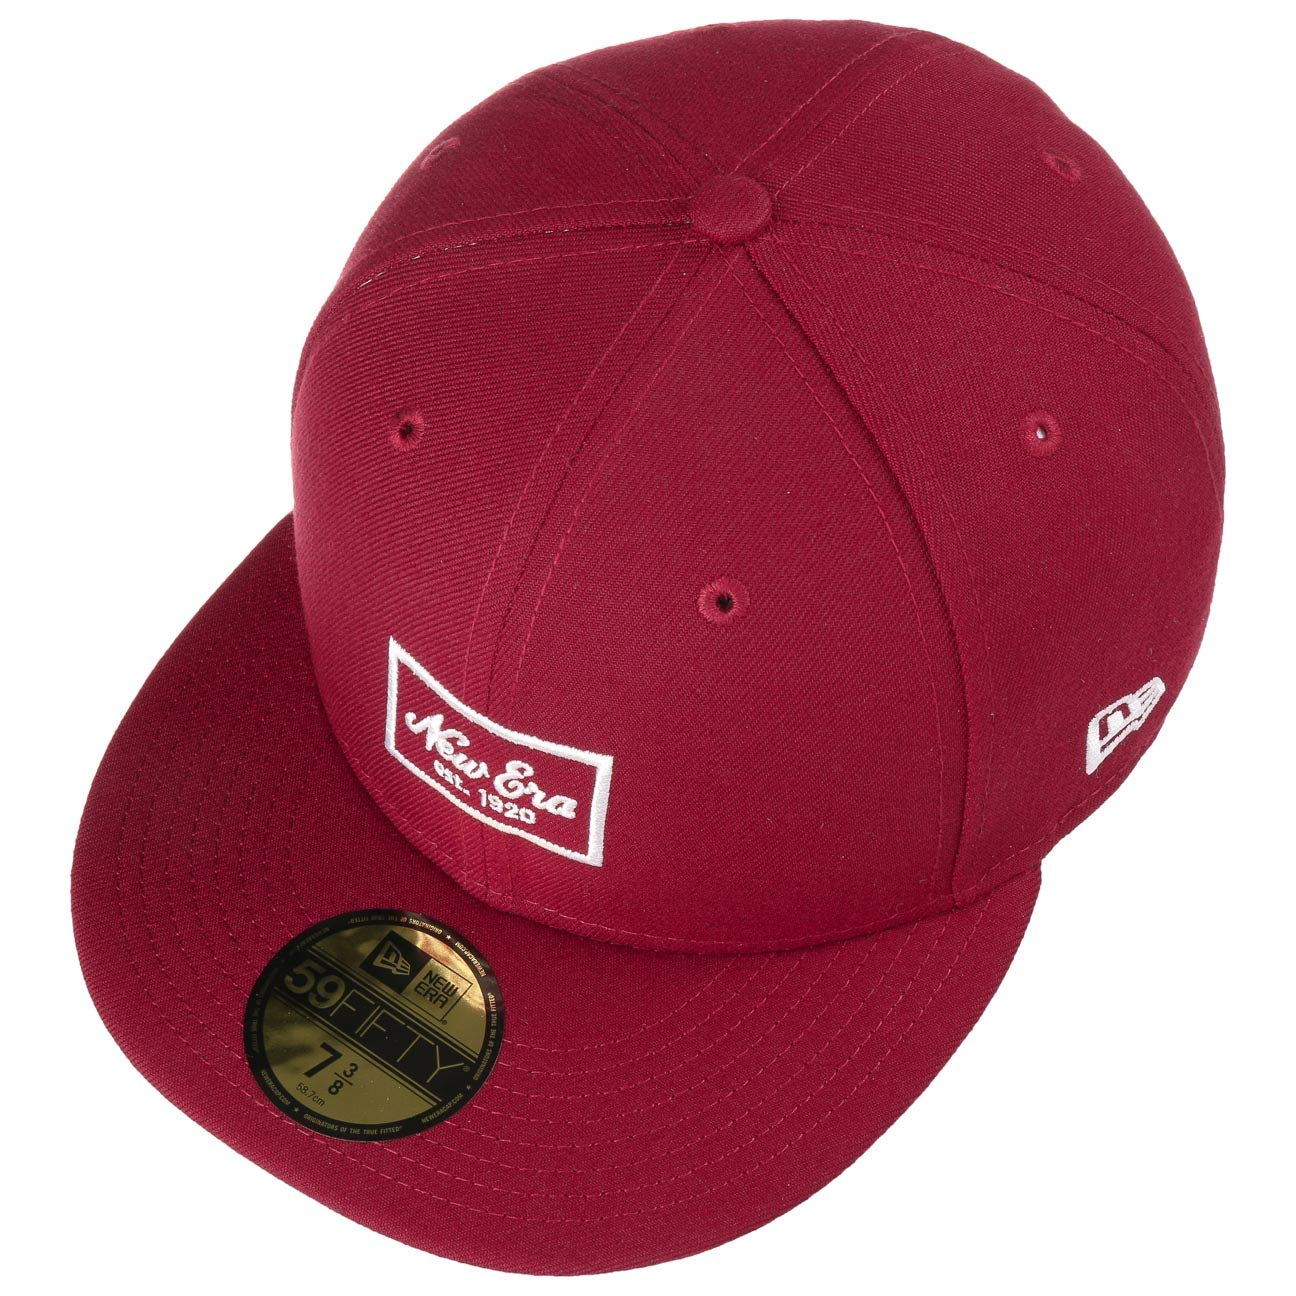 NEW ERA NEW YORK YANKEES MIGHTY STITCH BASEBALL CAP 59FIFTY Black SIZE 7 1//2